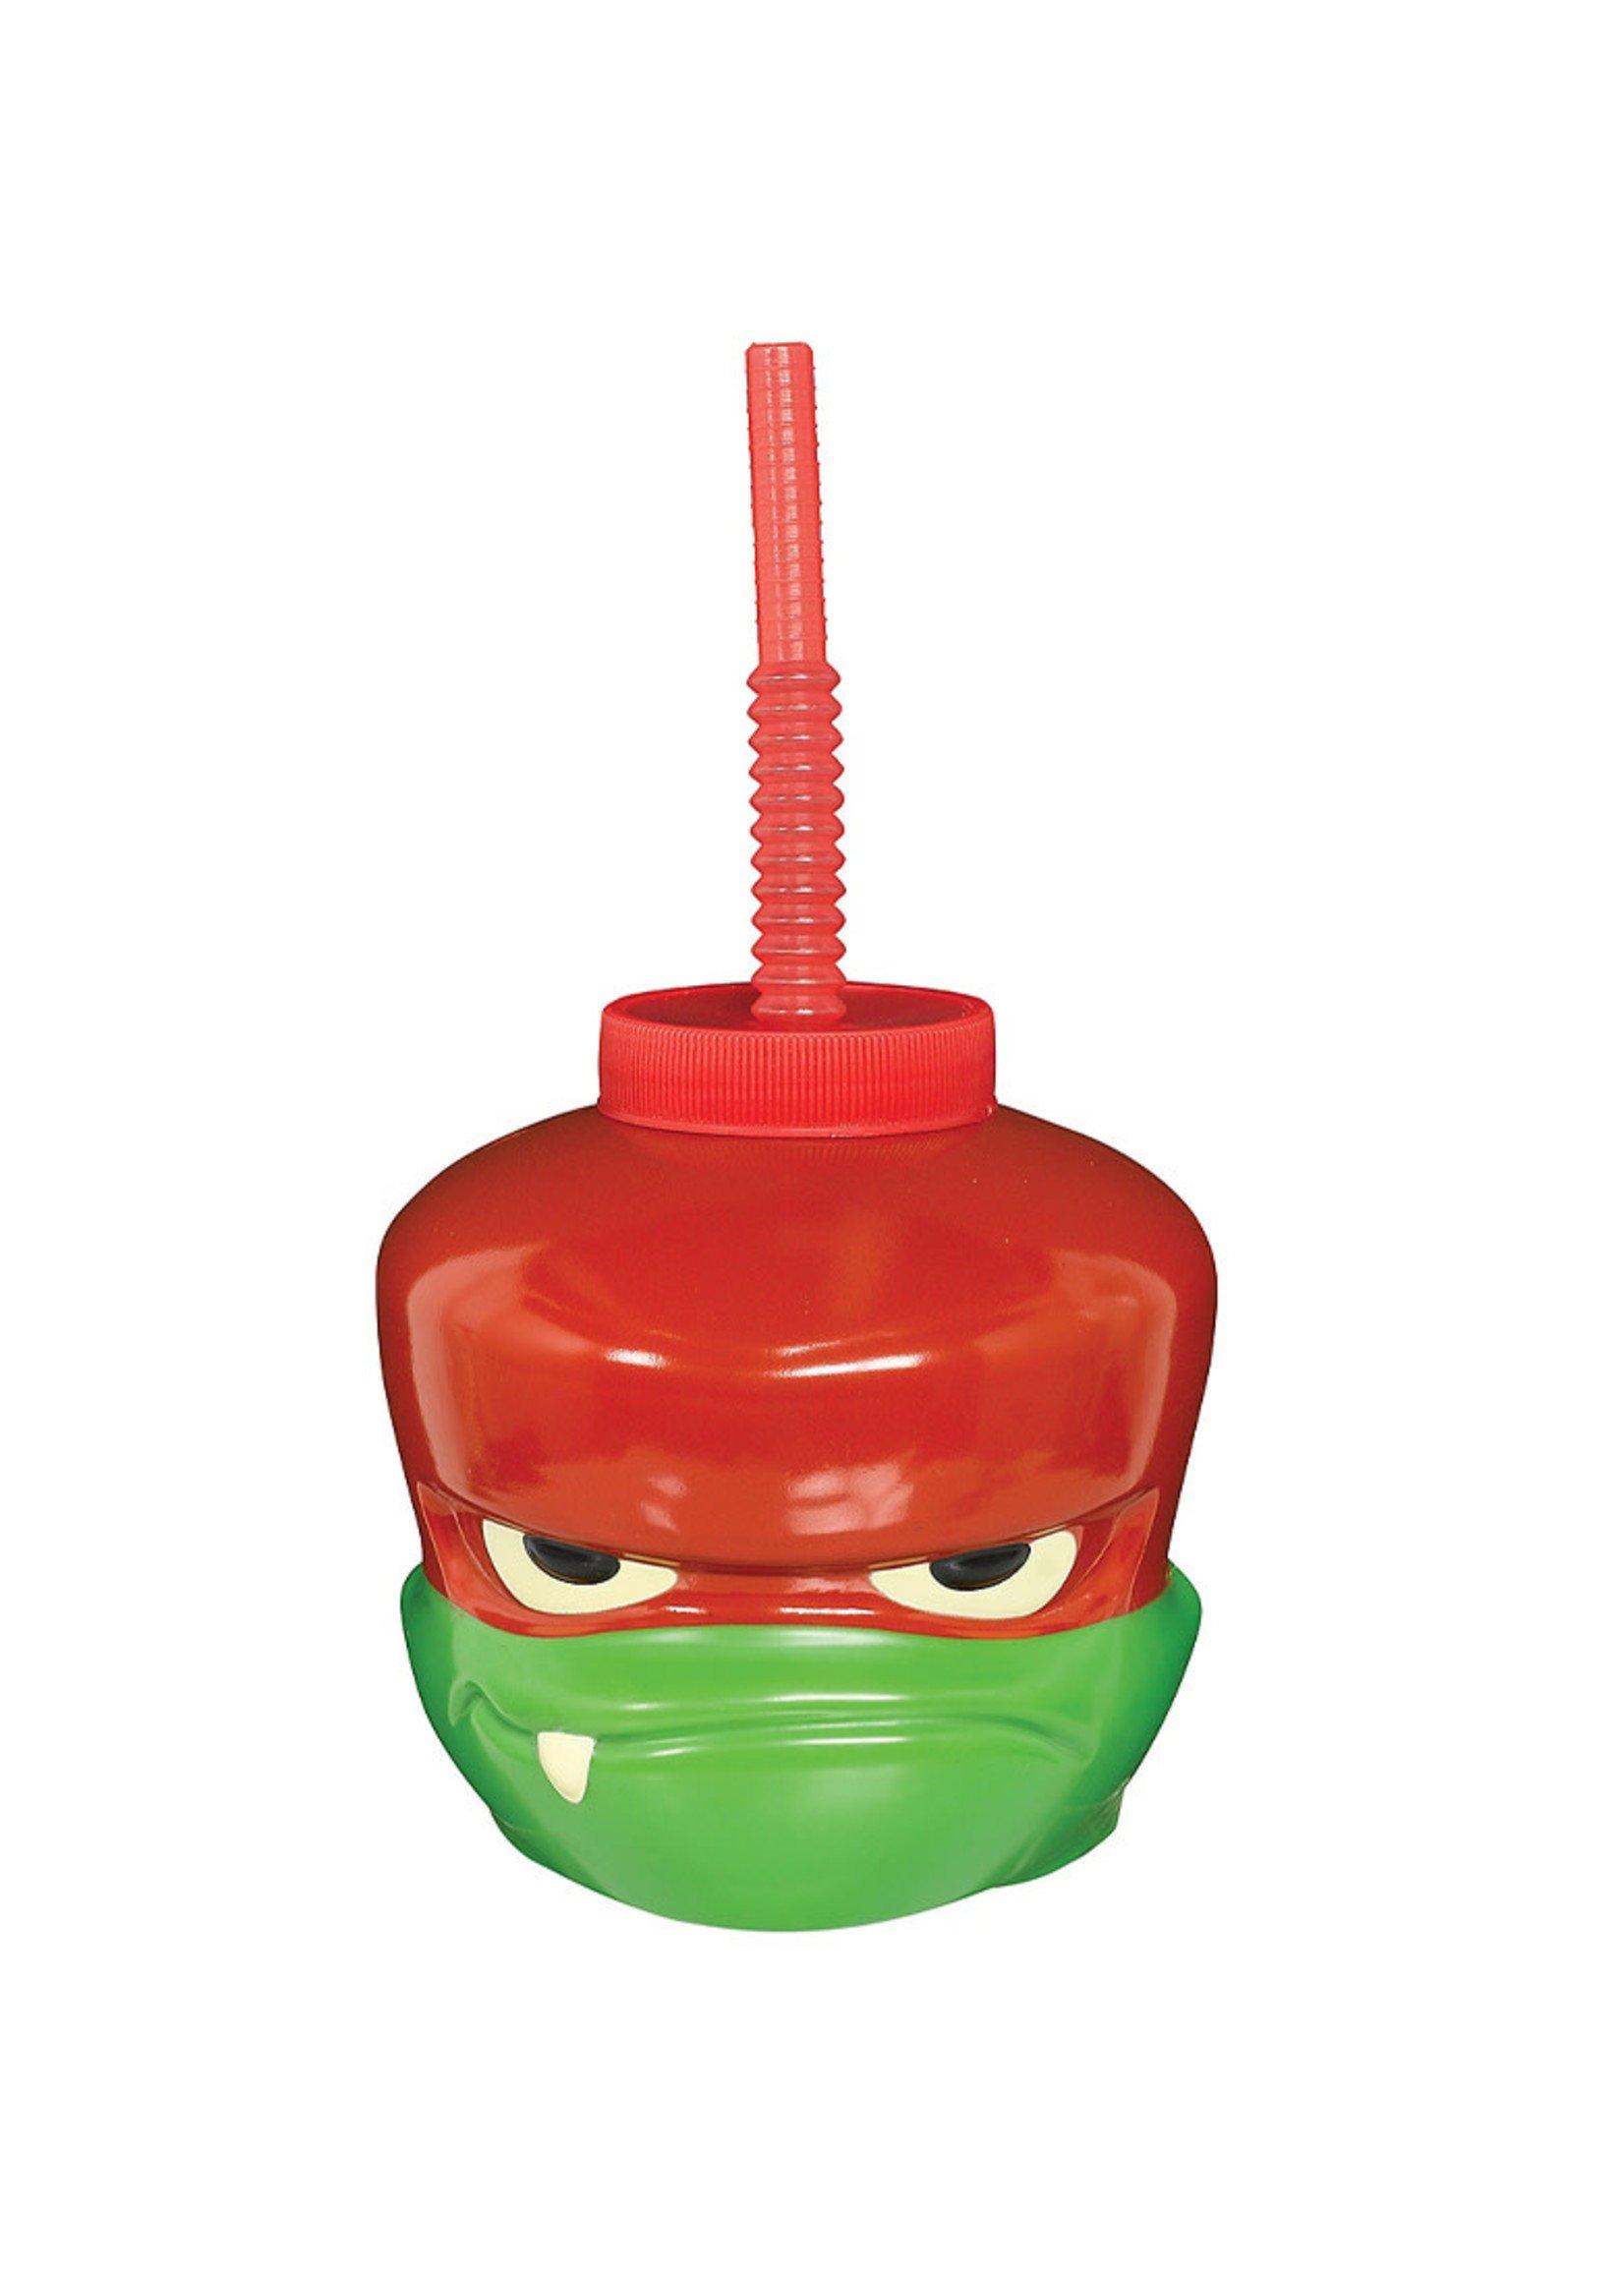 Raphael Cup with Straw - Rise of the Teenage Mutant Ninja Turtles